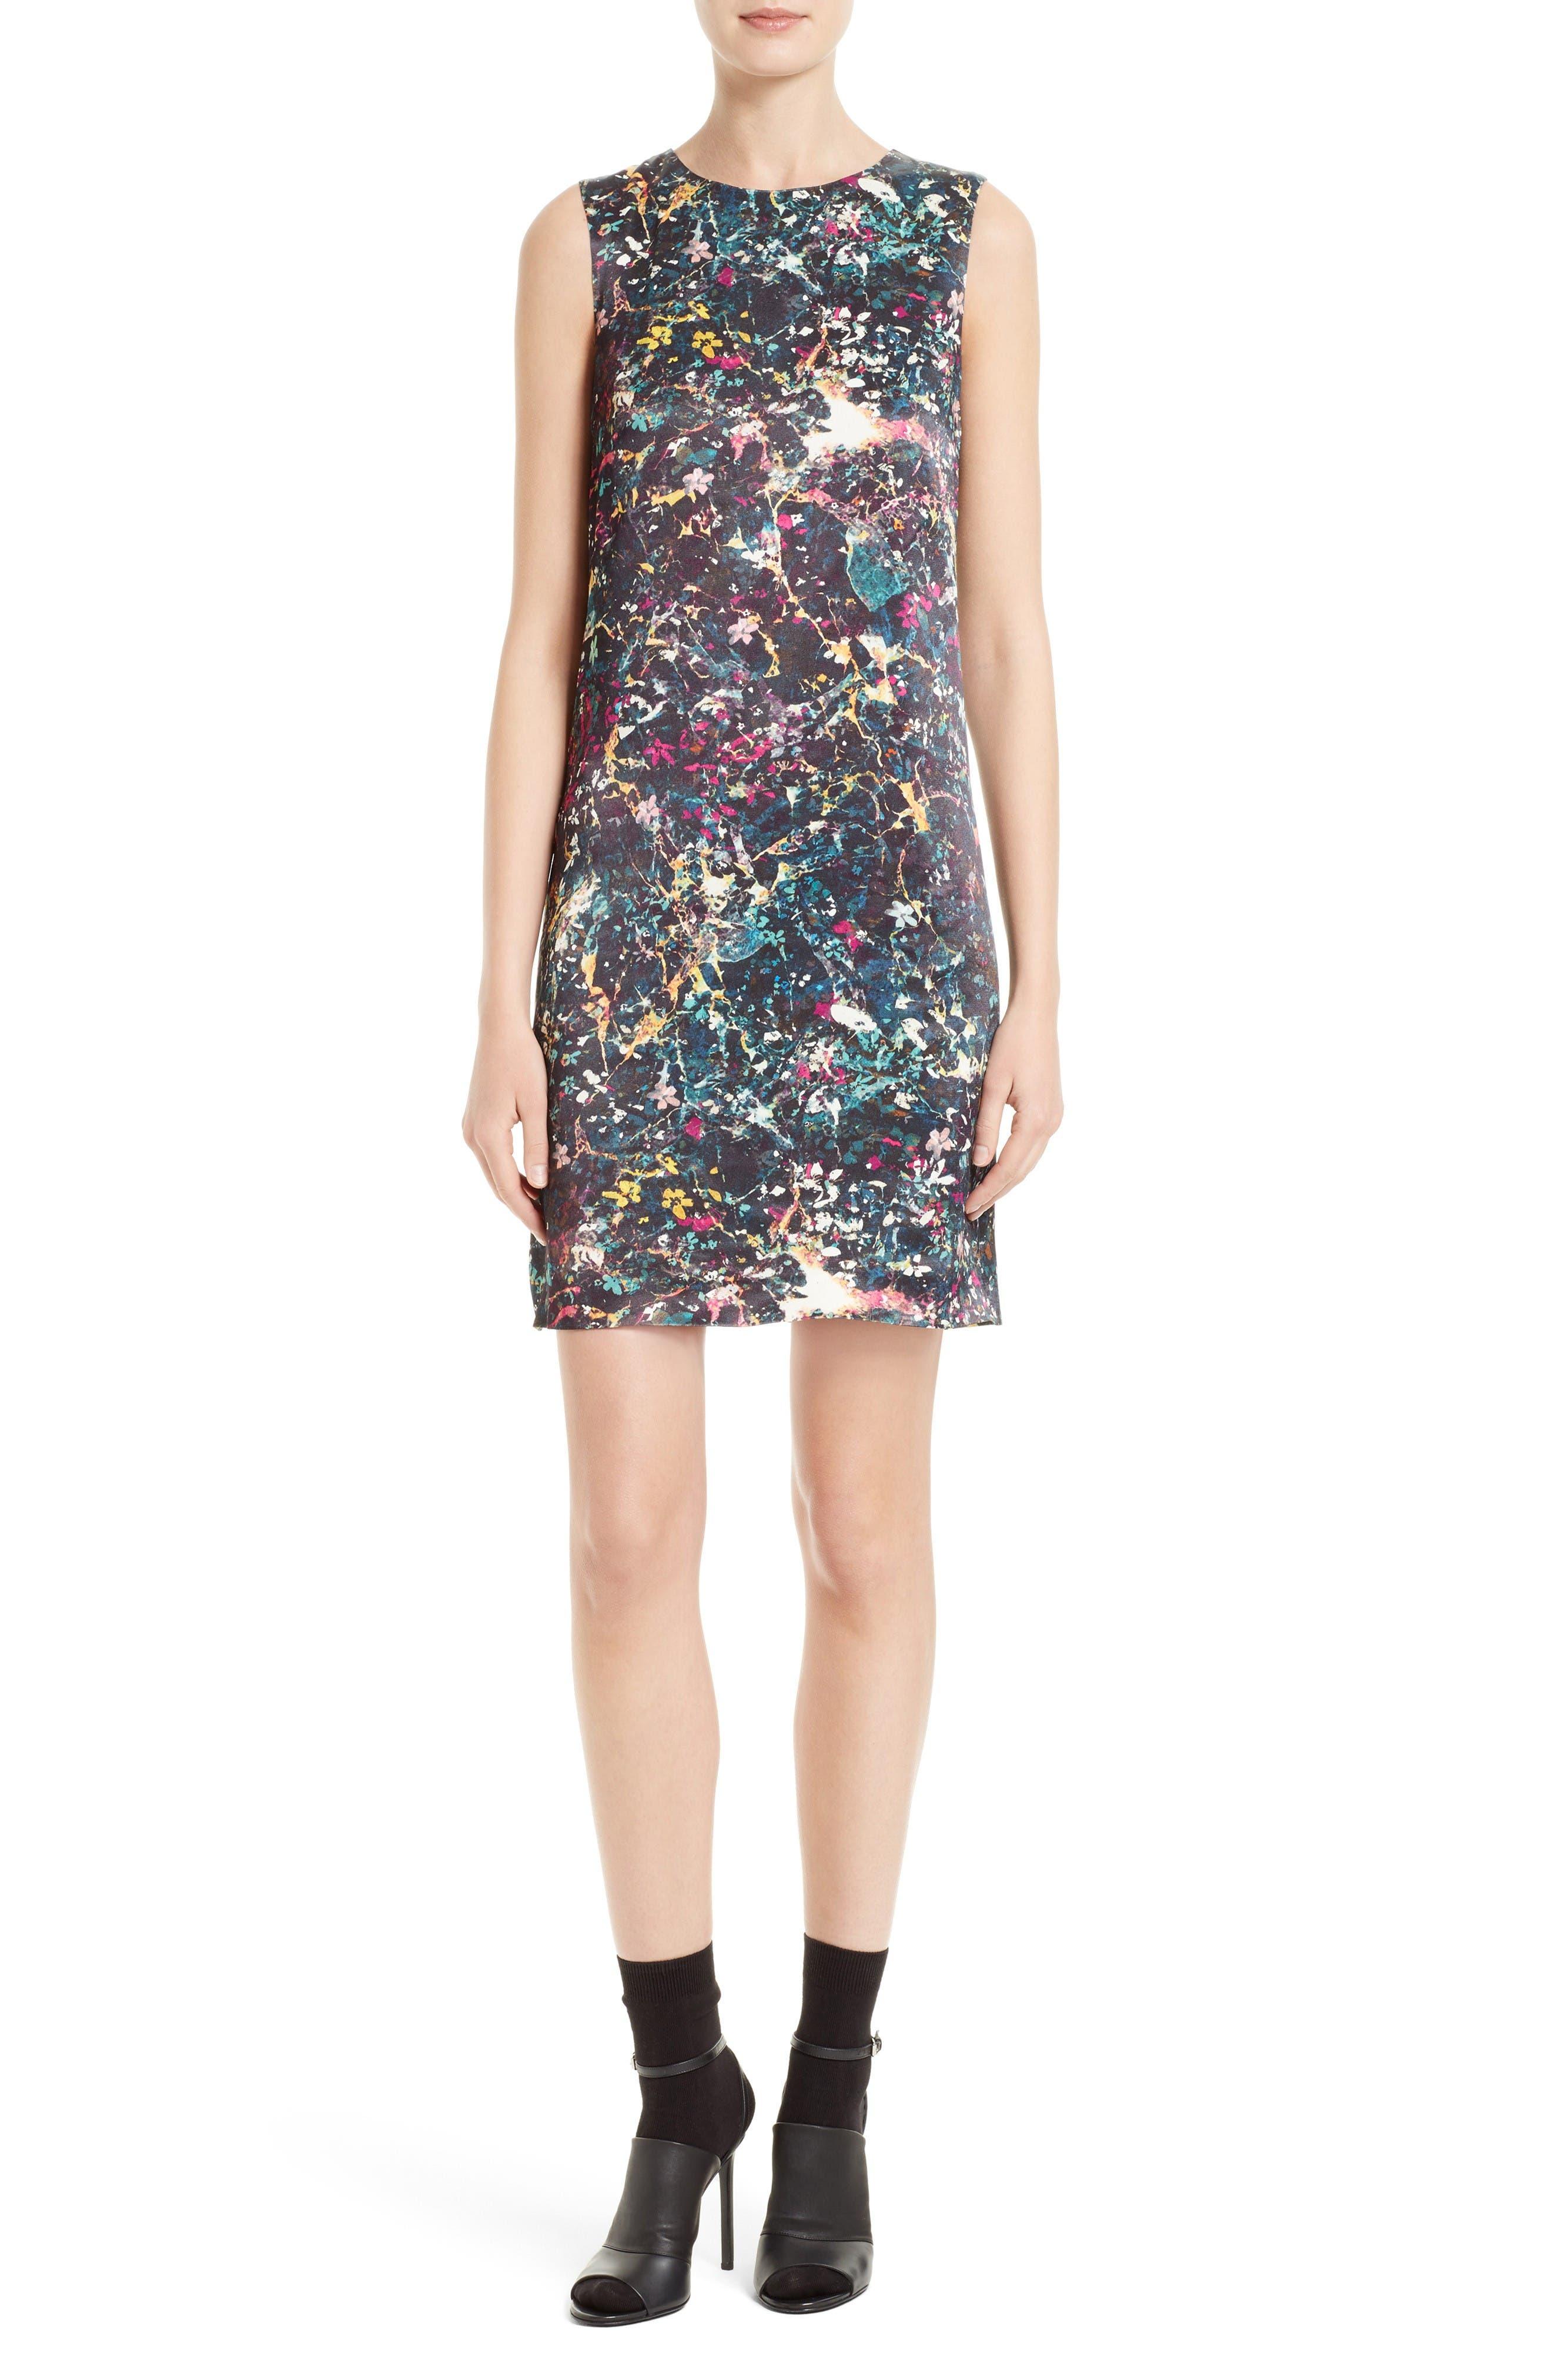 Alternate Image 1 Selected - M Missoni Floral Print Sheath Dress